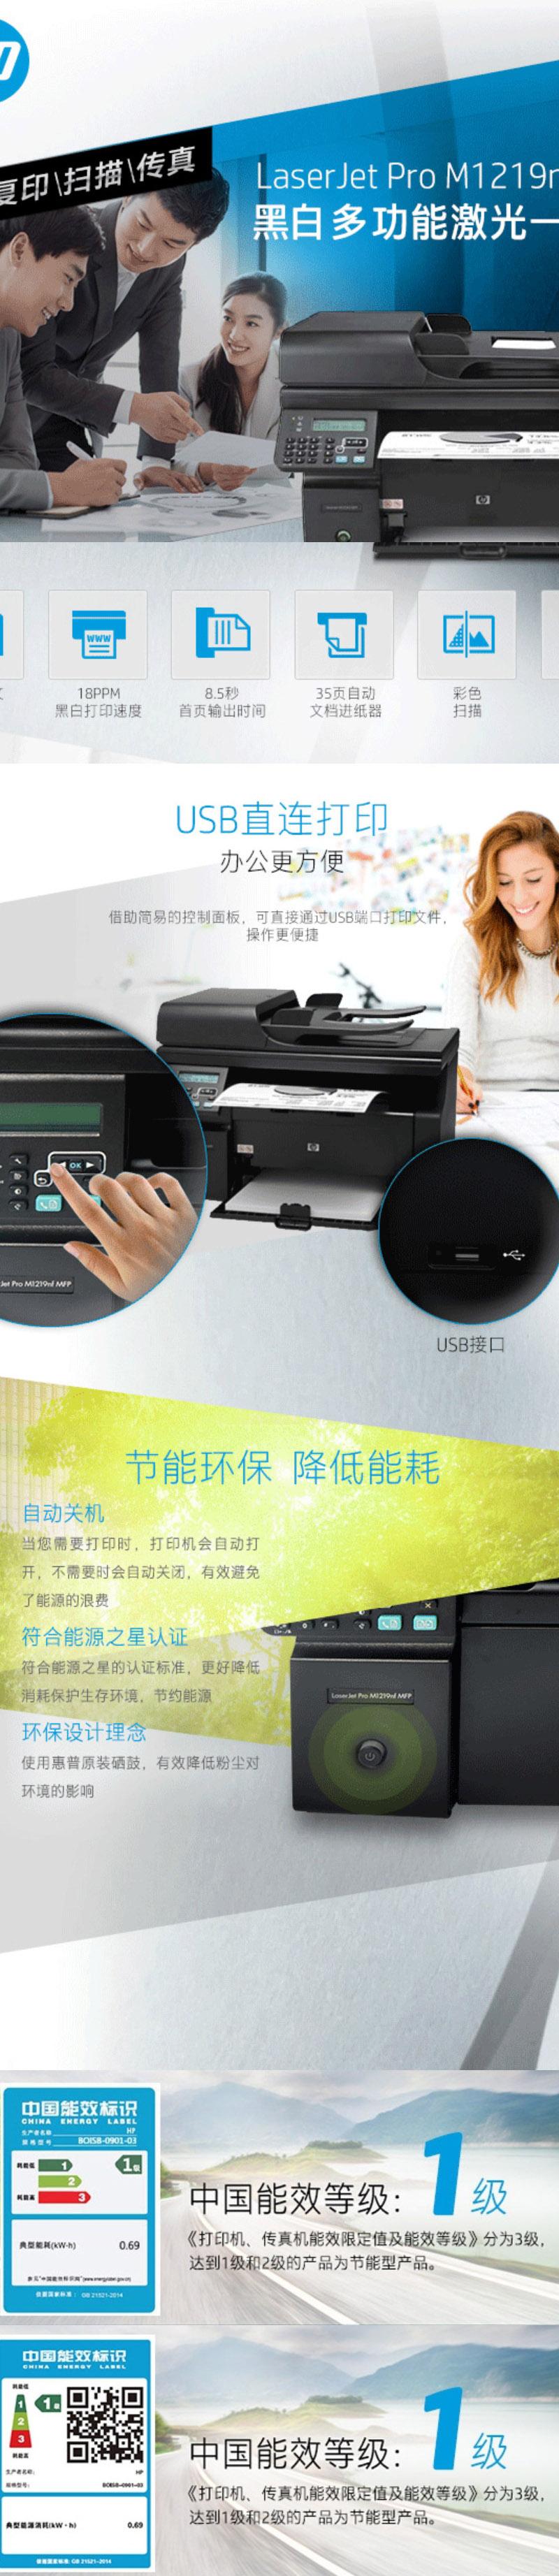 HP(惠普) HP LASERJET PRO M1219NF 多功能激光一体机(打印 复印 扫描 传真)1